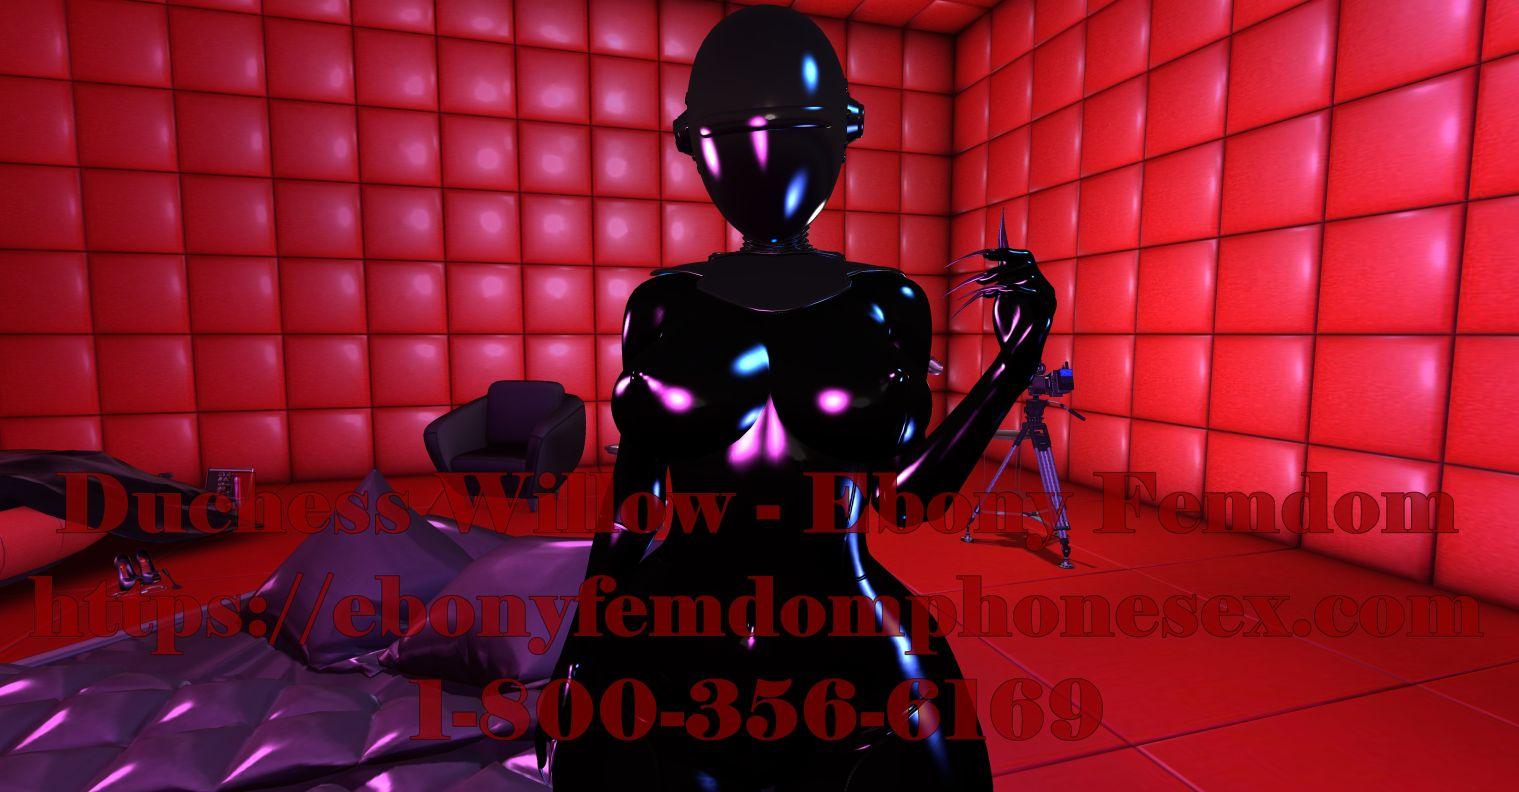 Halloween Blog Train Escape Room Ebony Femdom Latex Rubber Queen